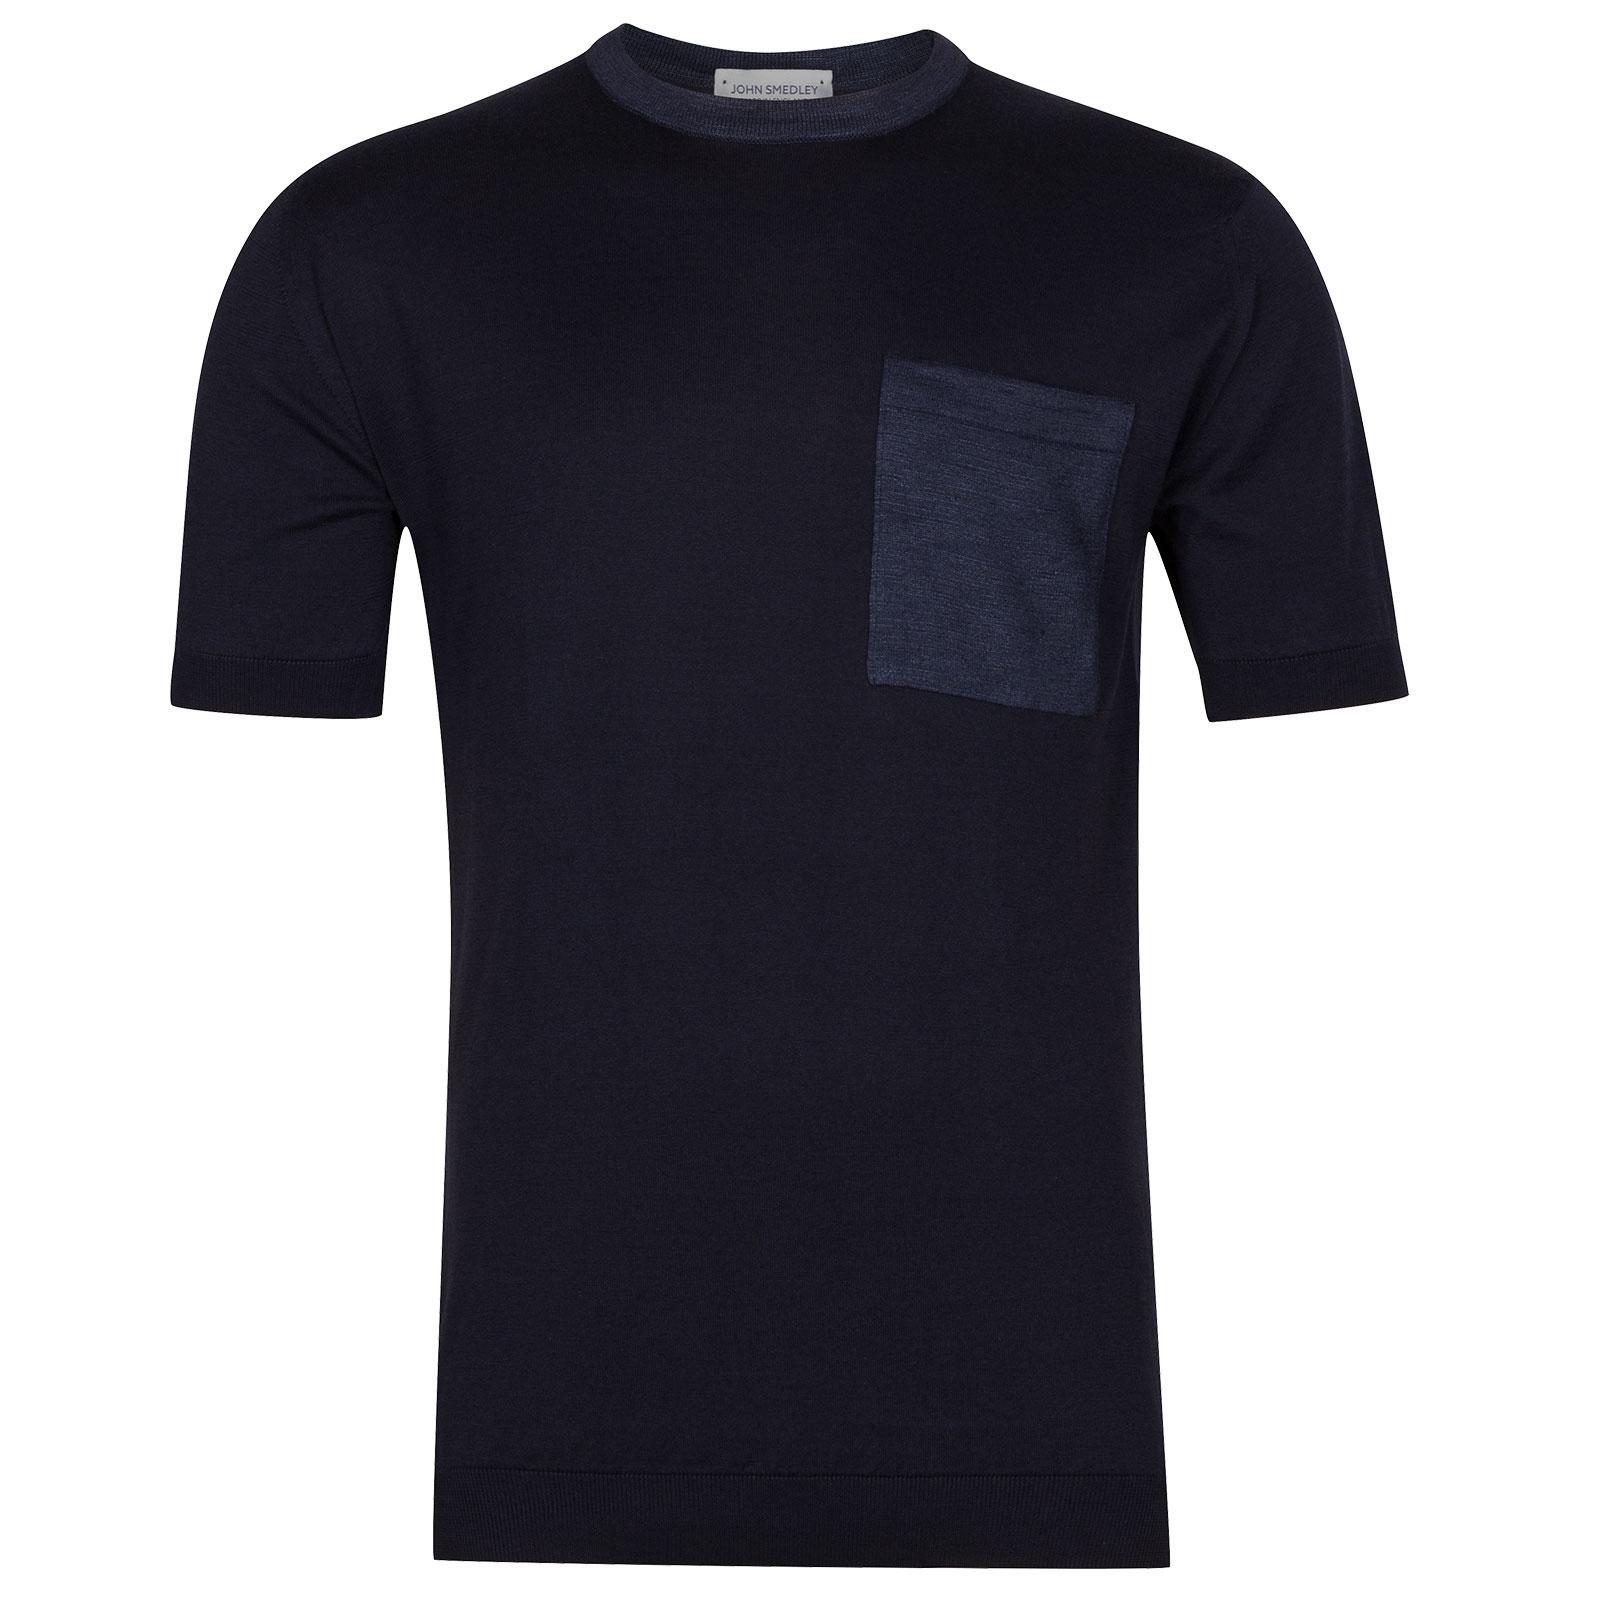 John Smedley Teel in Midnight T-Shirt-LGE